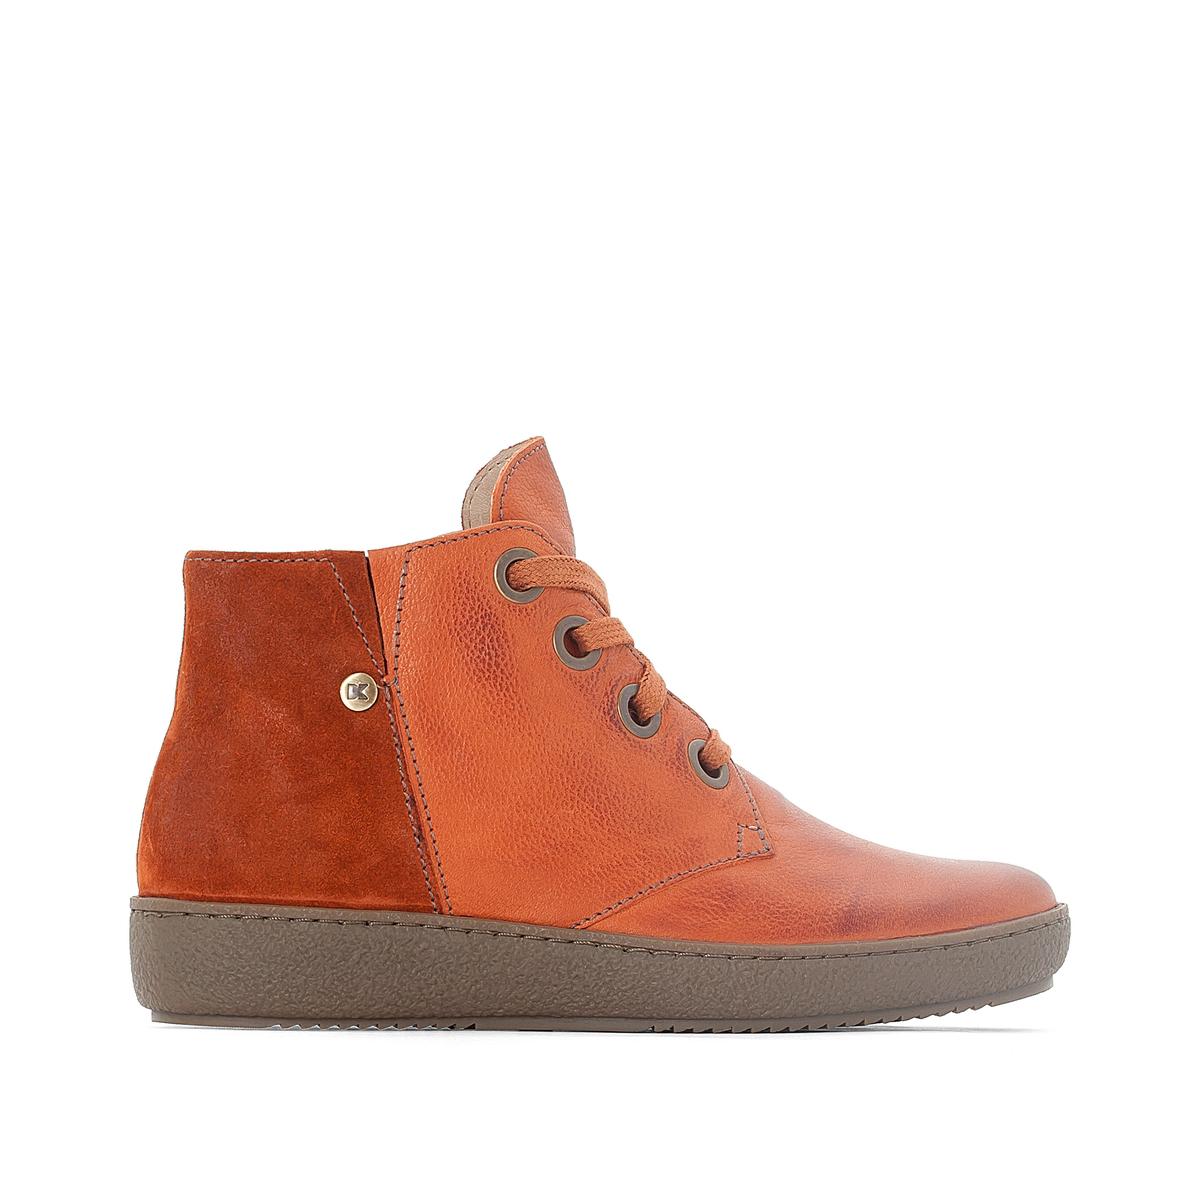 Ботинки кожаные Faleen цены онлайн